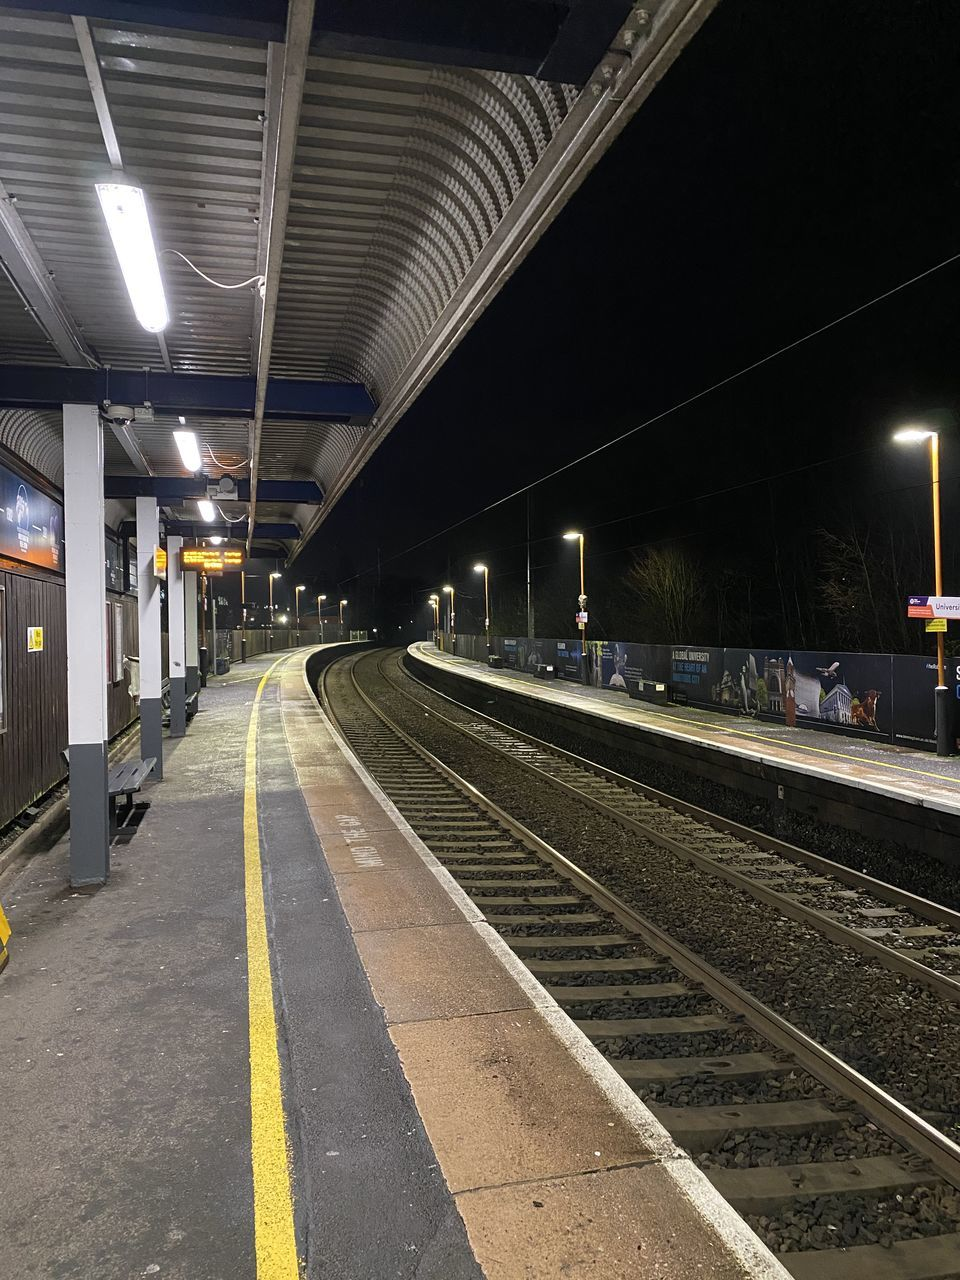 VIEW OF RAILROAD STATION PLATFORM AT RAILWAY TRACKS